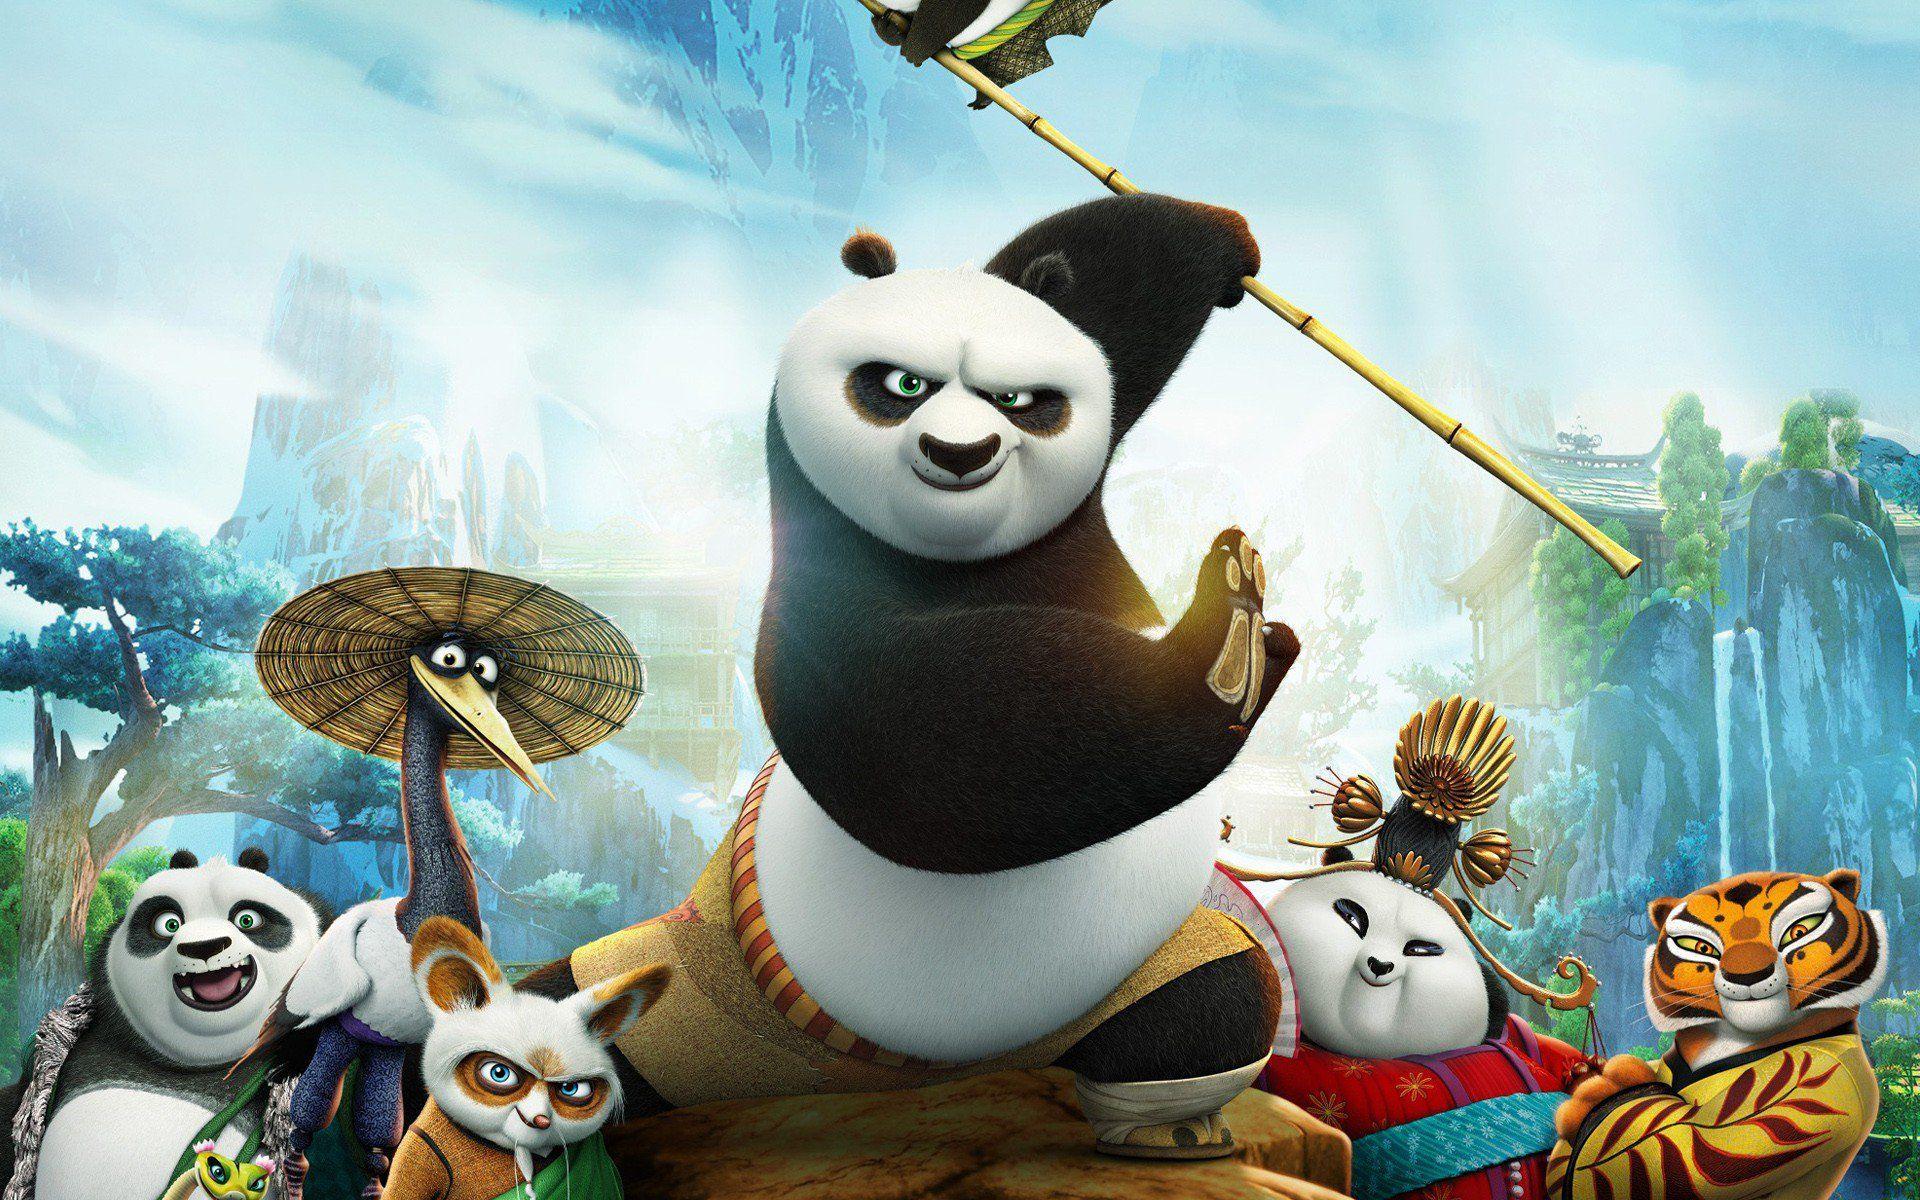 Kung Fu Panda 3 Wide Wallpapers, Download Free HD